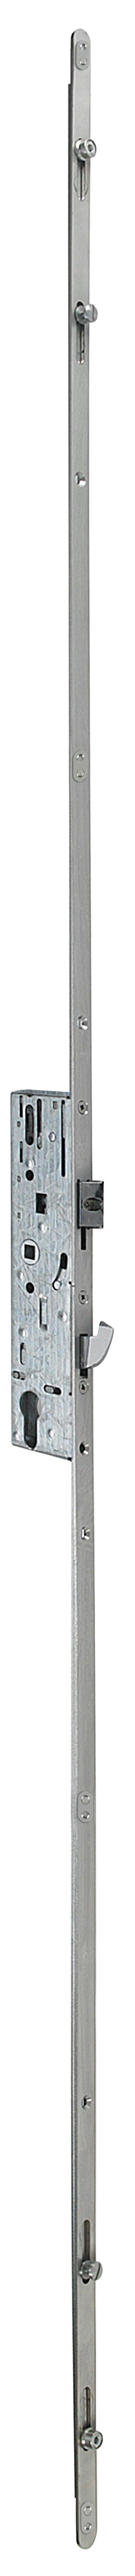 Universal Replacement Lock for PVCu Doors